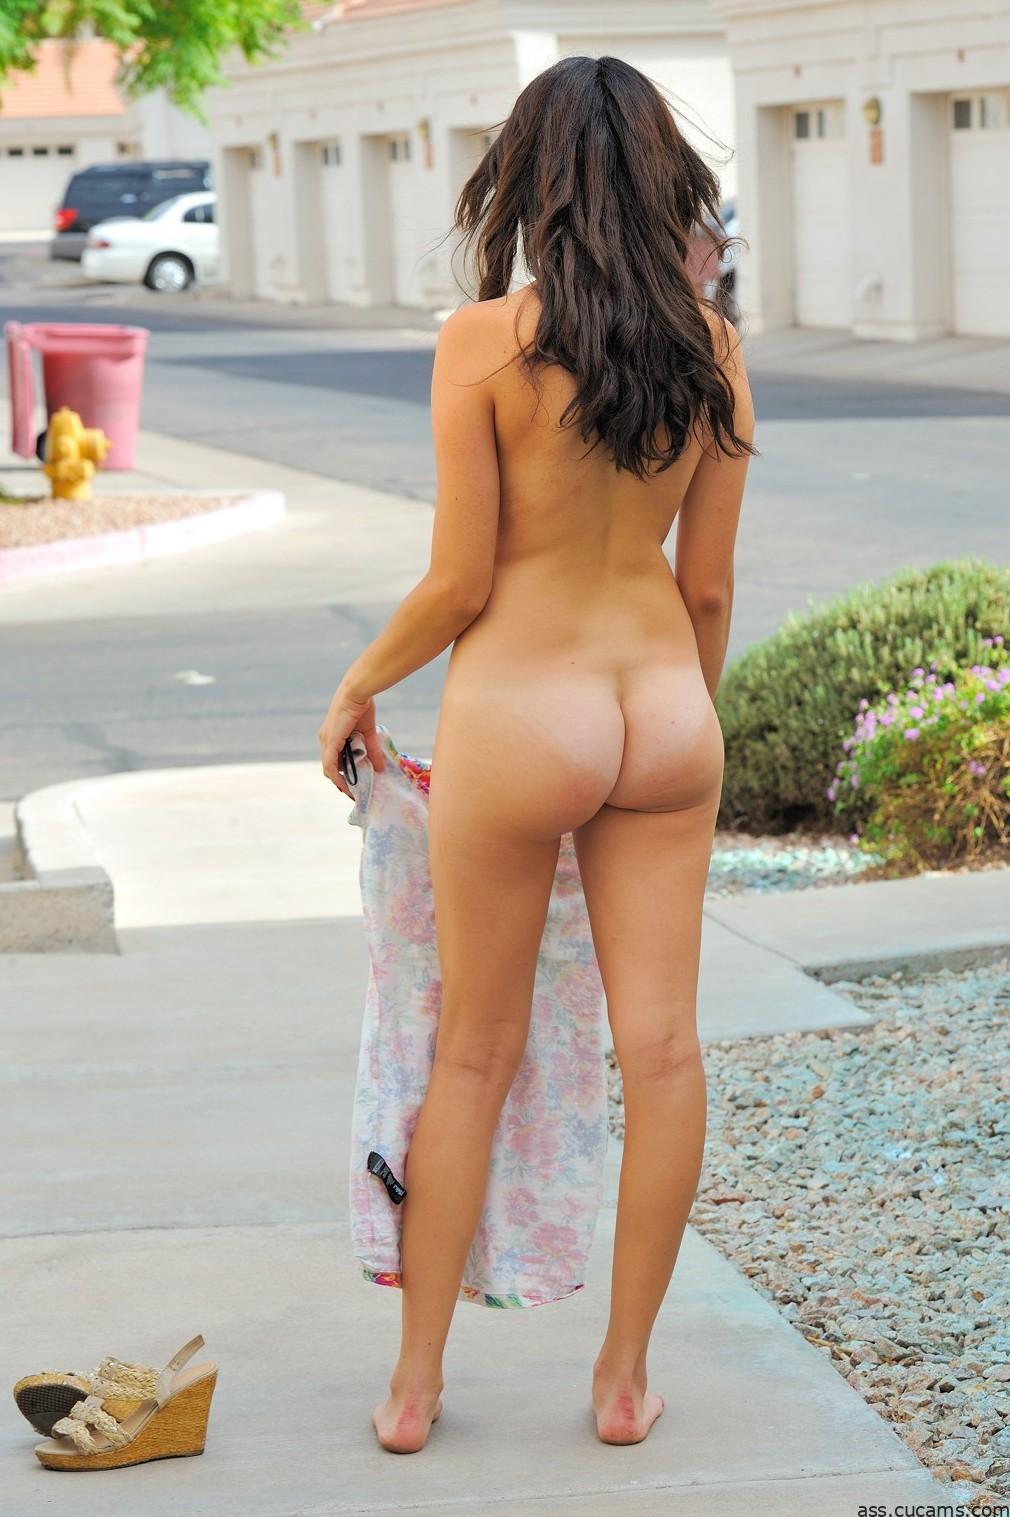 Ass Hooters Straight by ass.cucams.com